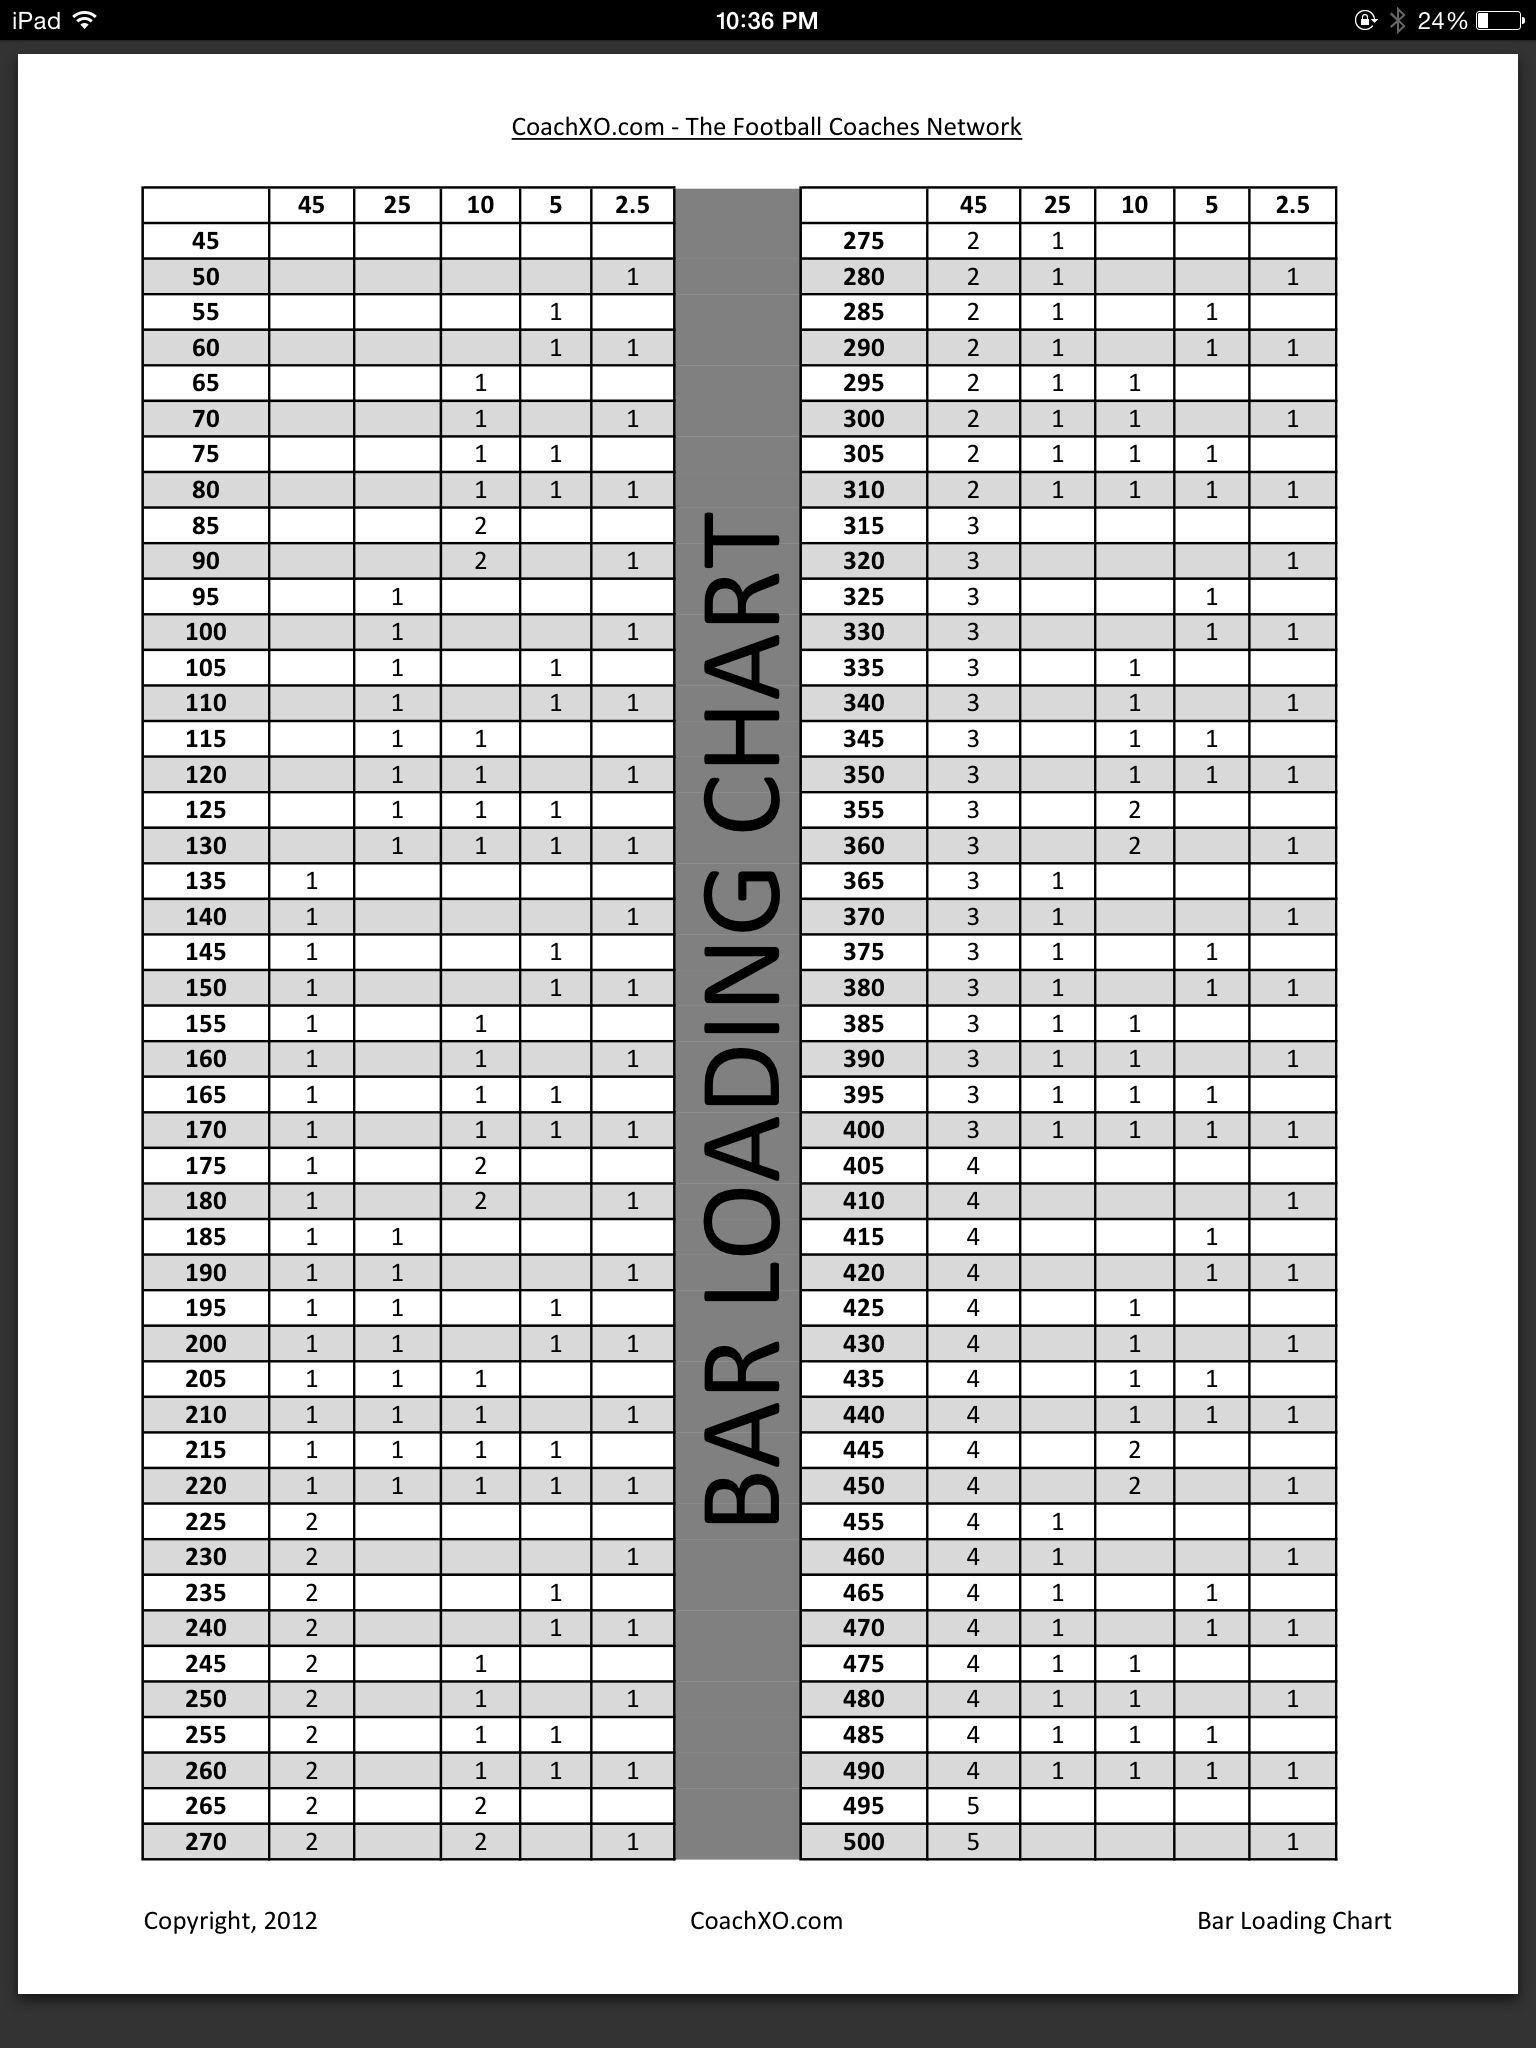 New Weight Max Chart Exceltemplate Xls Xlstemplate Xlsformat Excelformat Microsoftexcel Barbell Weights Weight Charts Weight